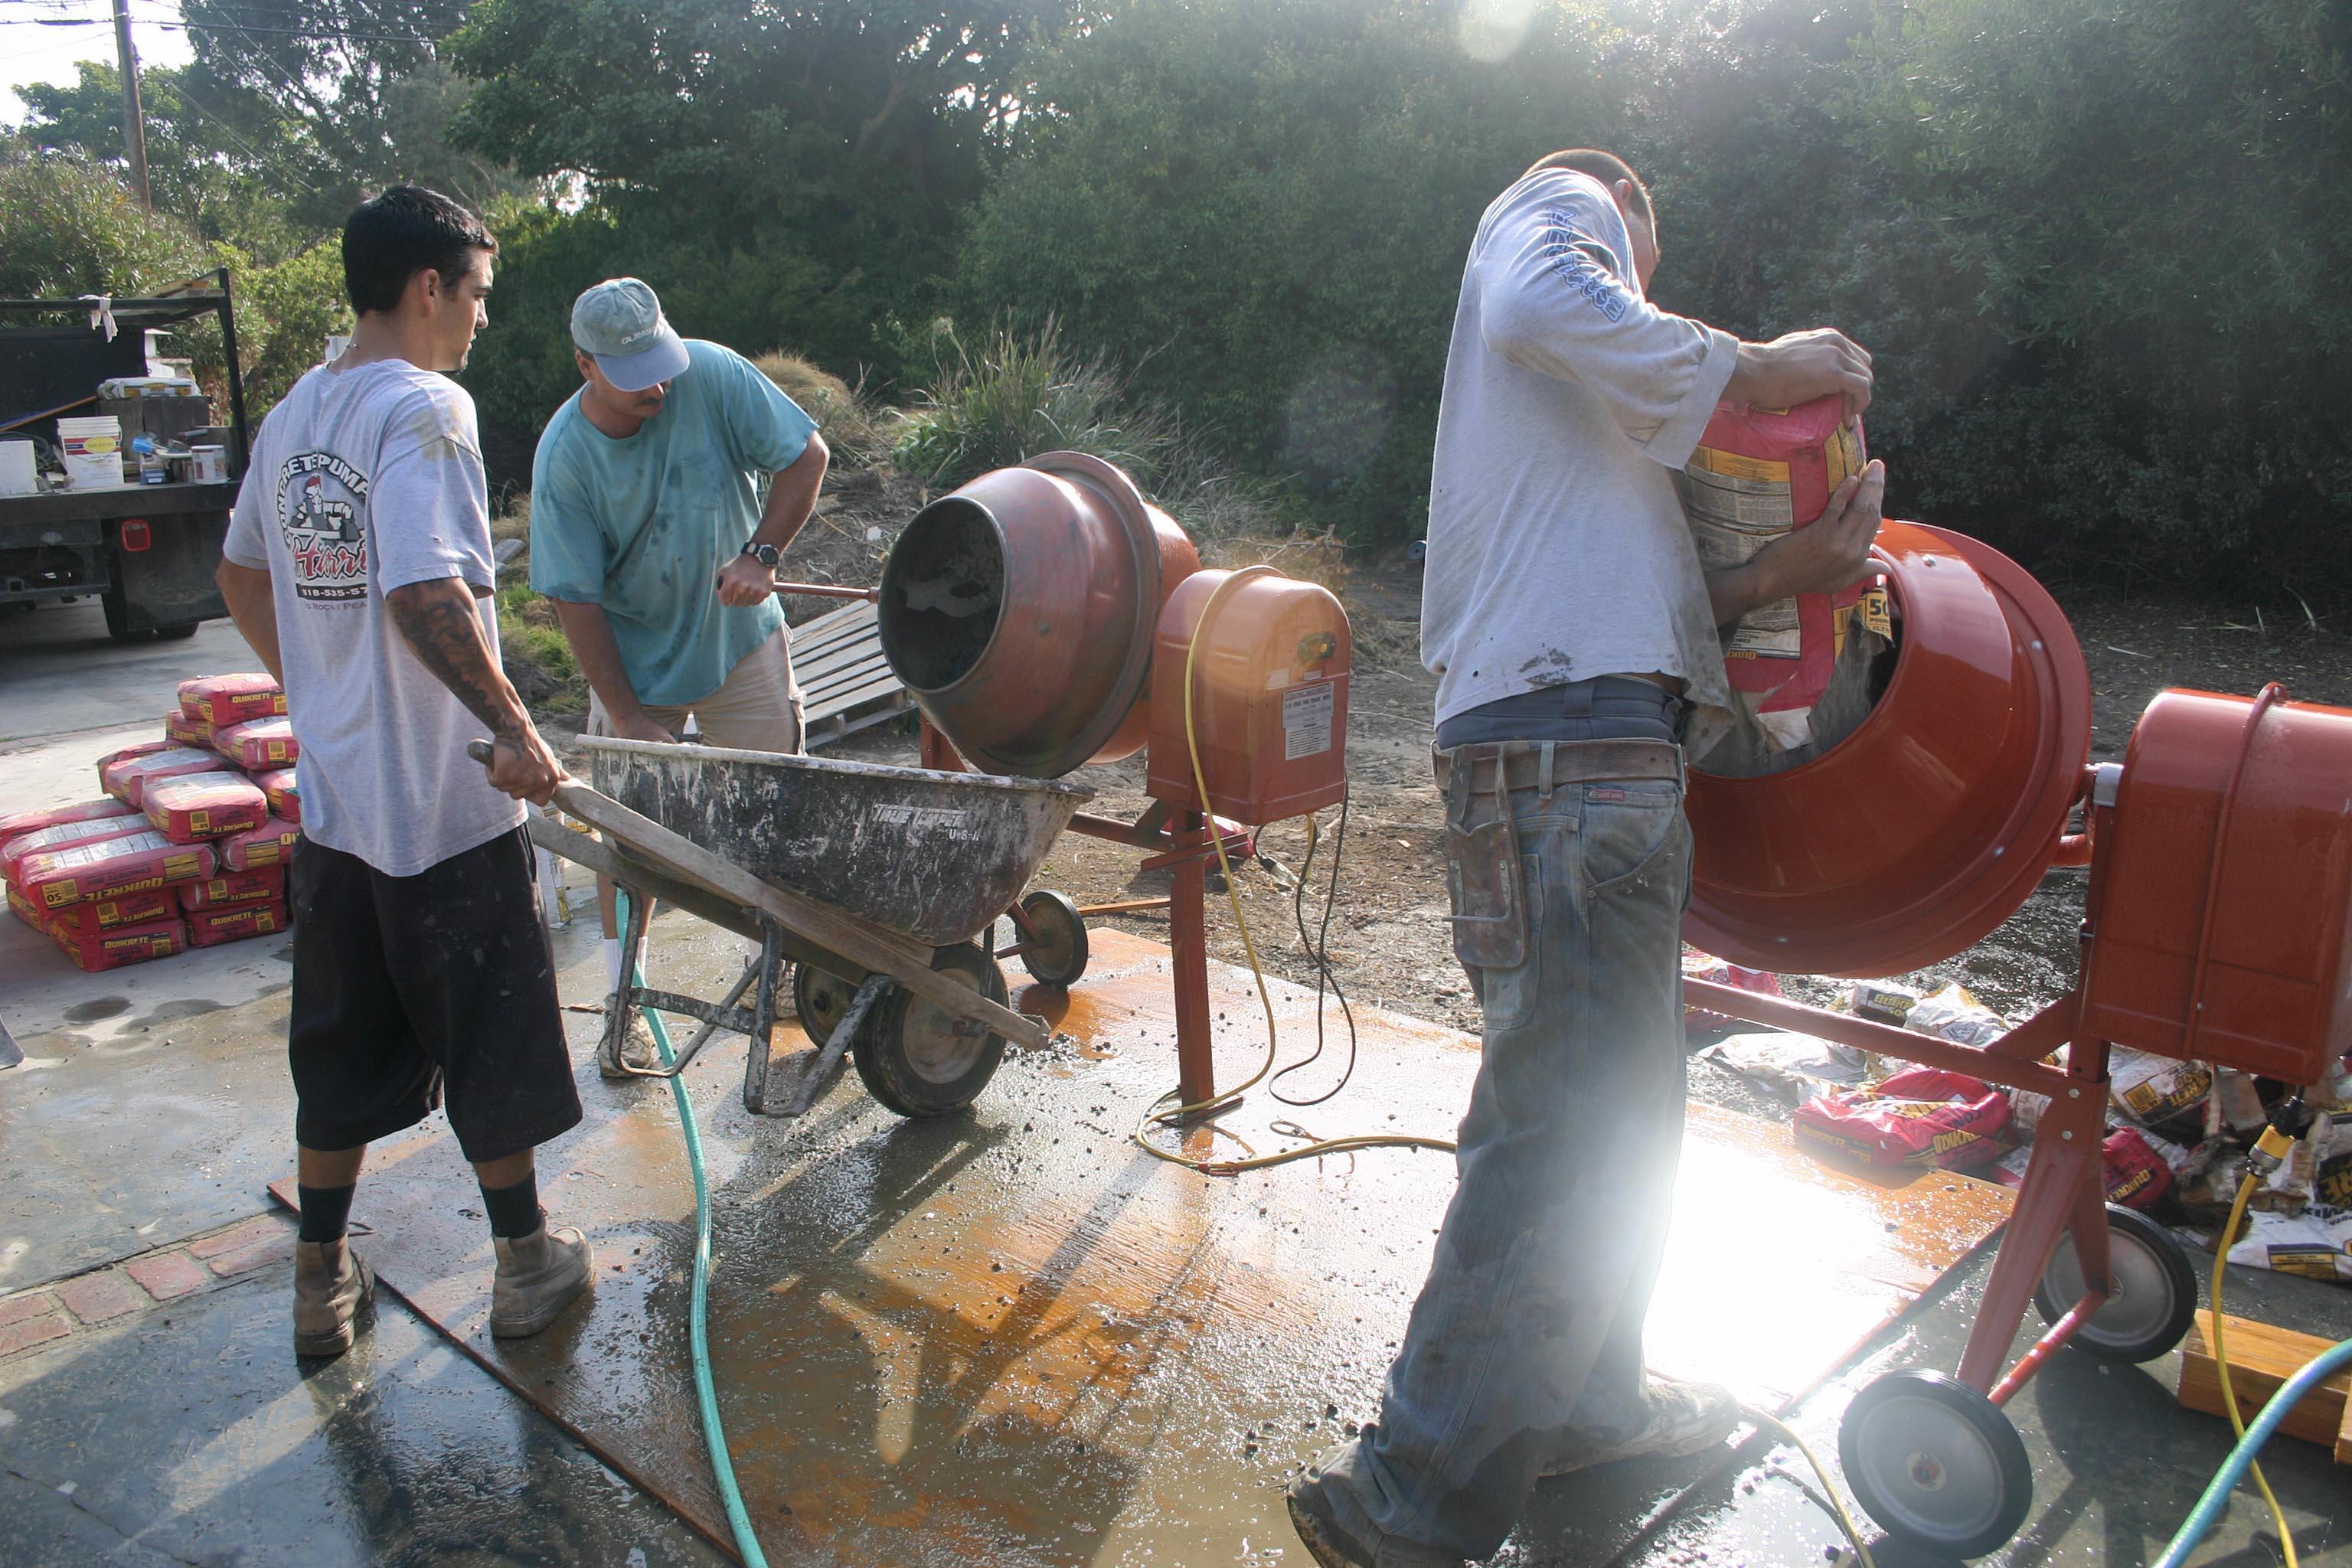 conc-tub mixing